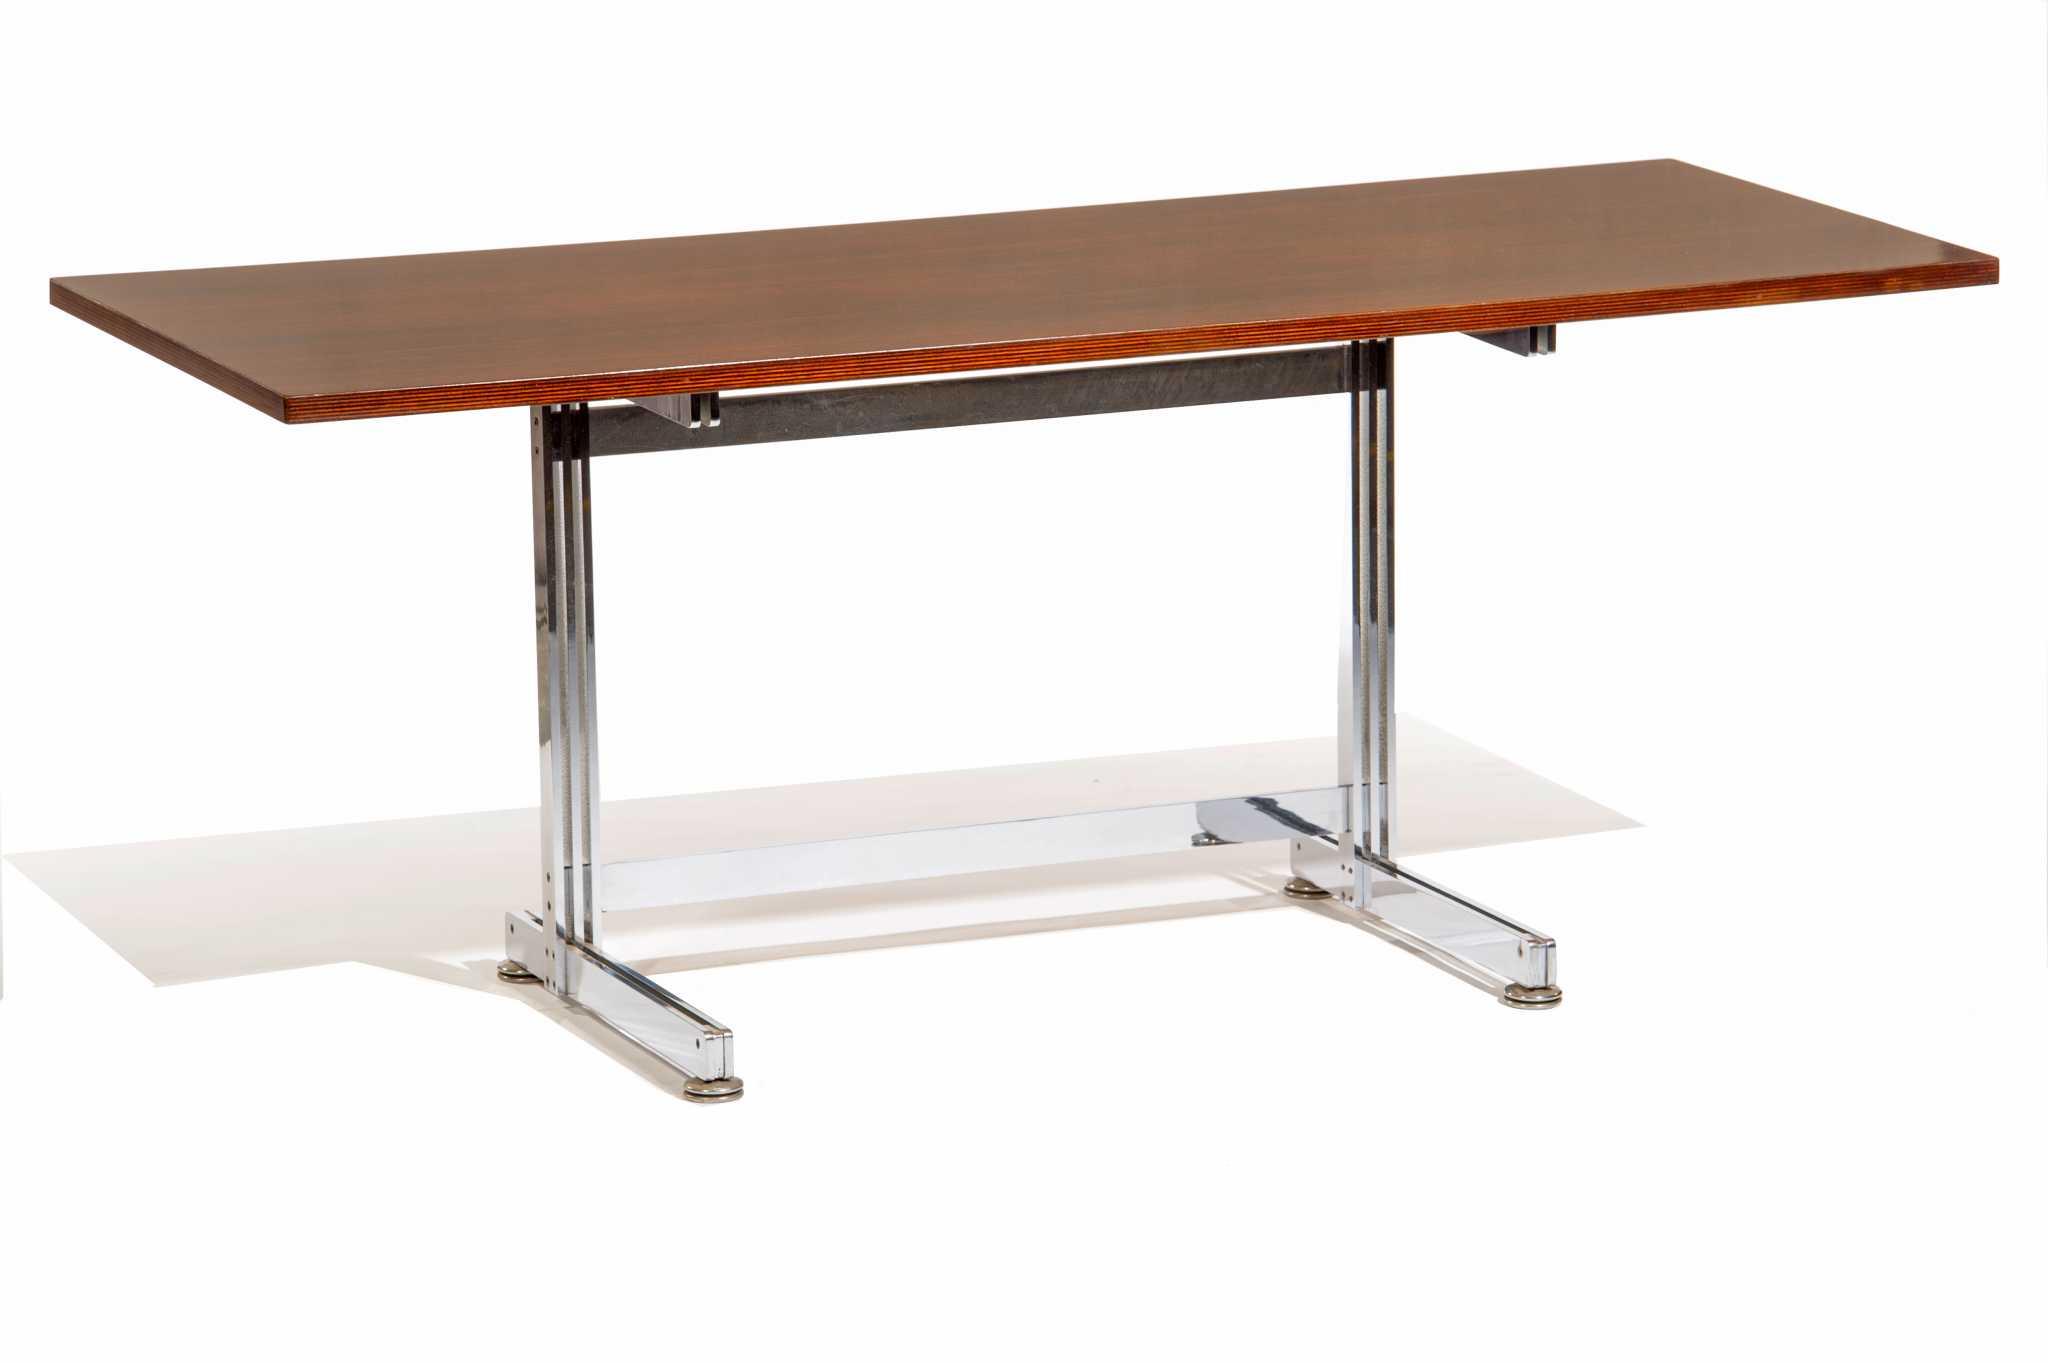 jules wabbes table bureau haesaerts le grelle antiquit s et restauration gustave. Black Bedroom Furniture Sets. Home Design Ideas